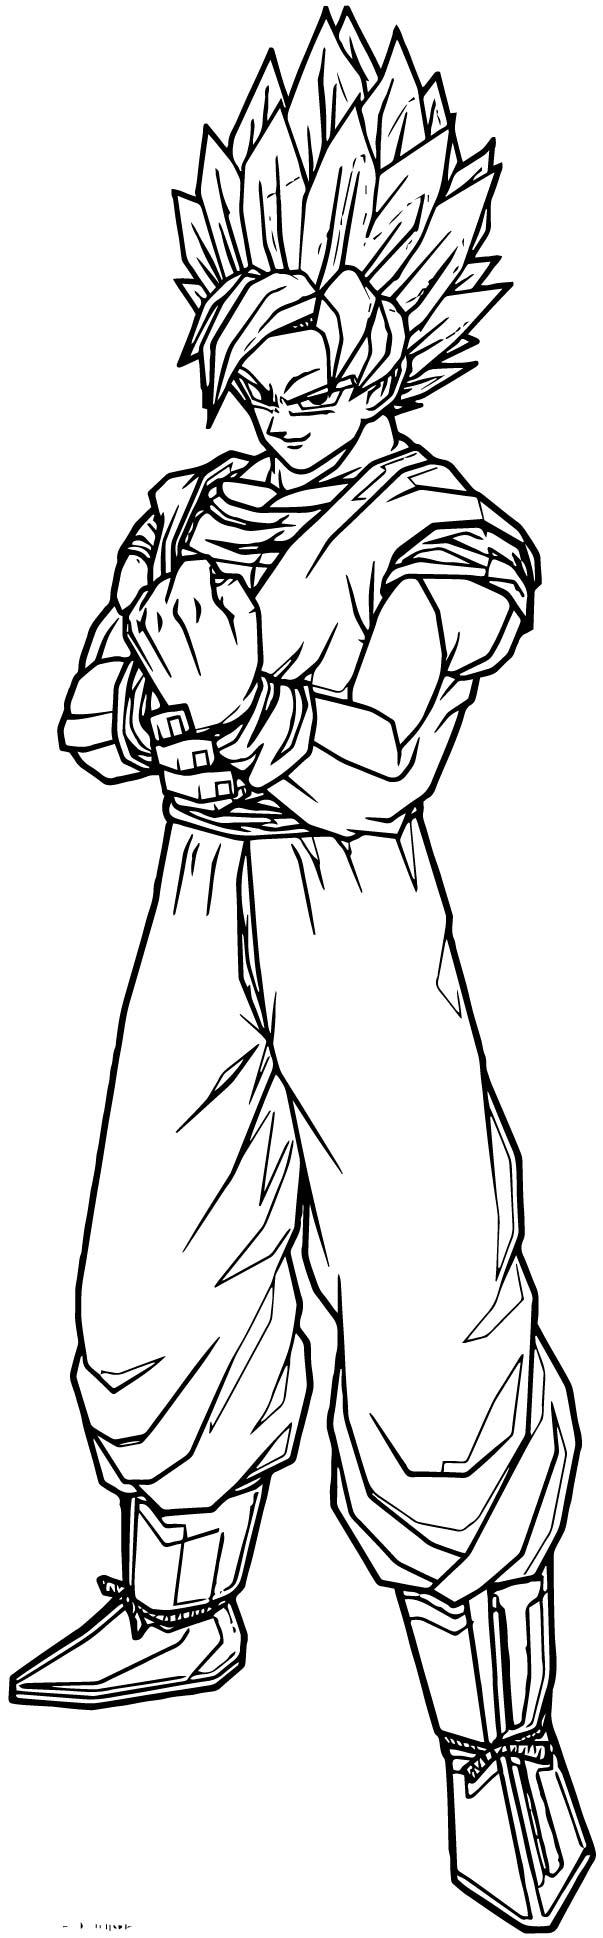 Goku We Coloring Page 192